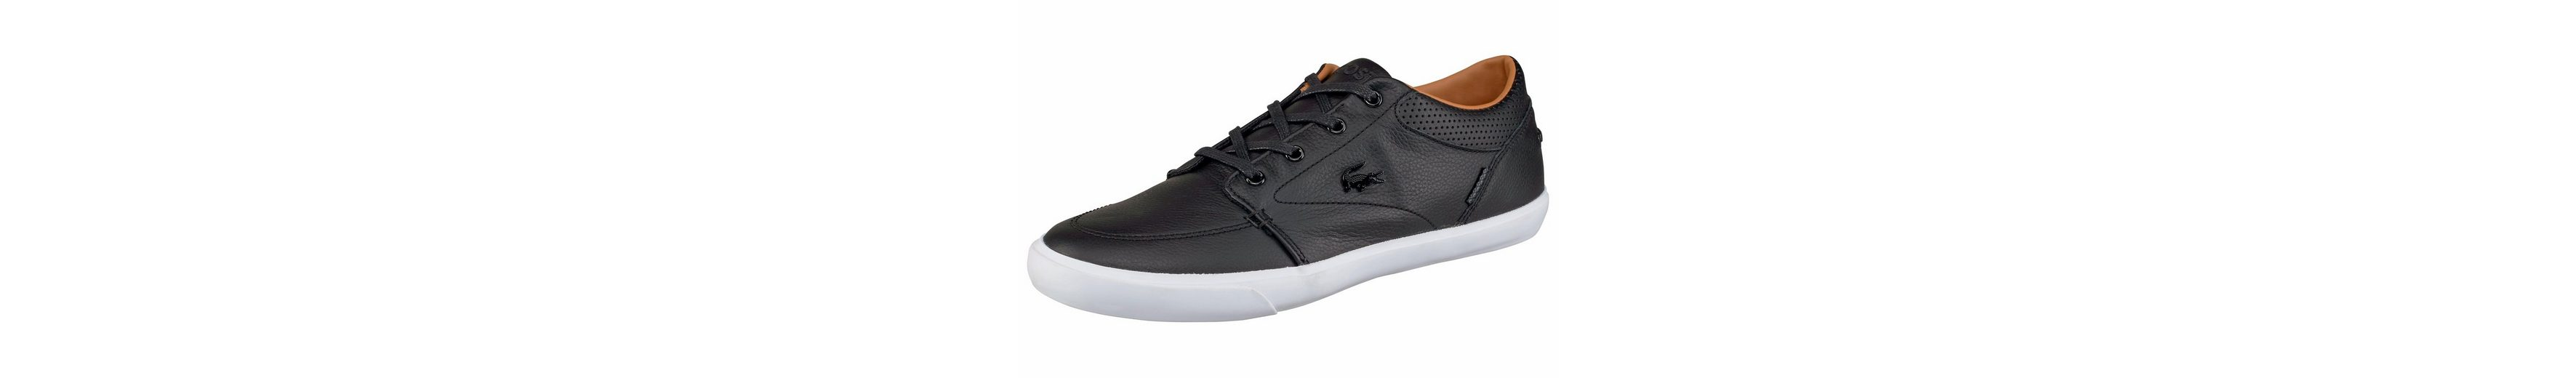 Lacoste Bayliss Vulc PRM US SPM Sneaker Freies Verschiffen Niedriger Versand Outlet Große Überraschung 0I2nx